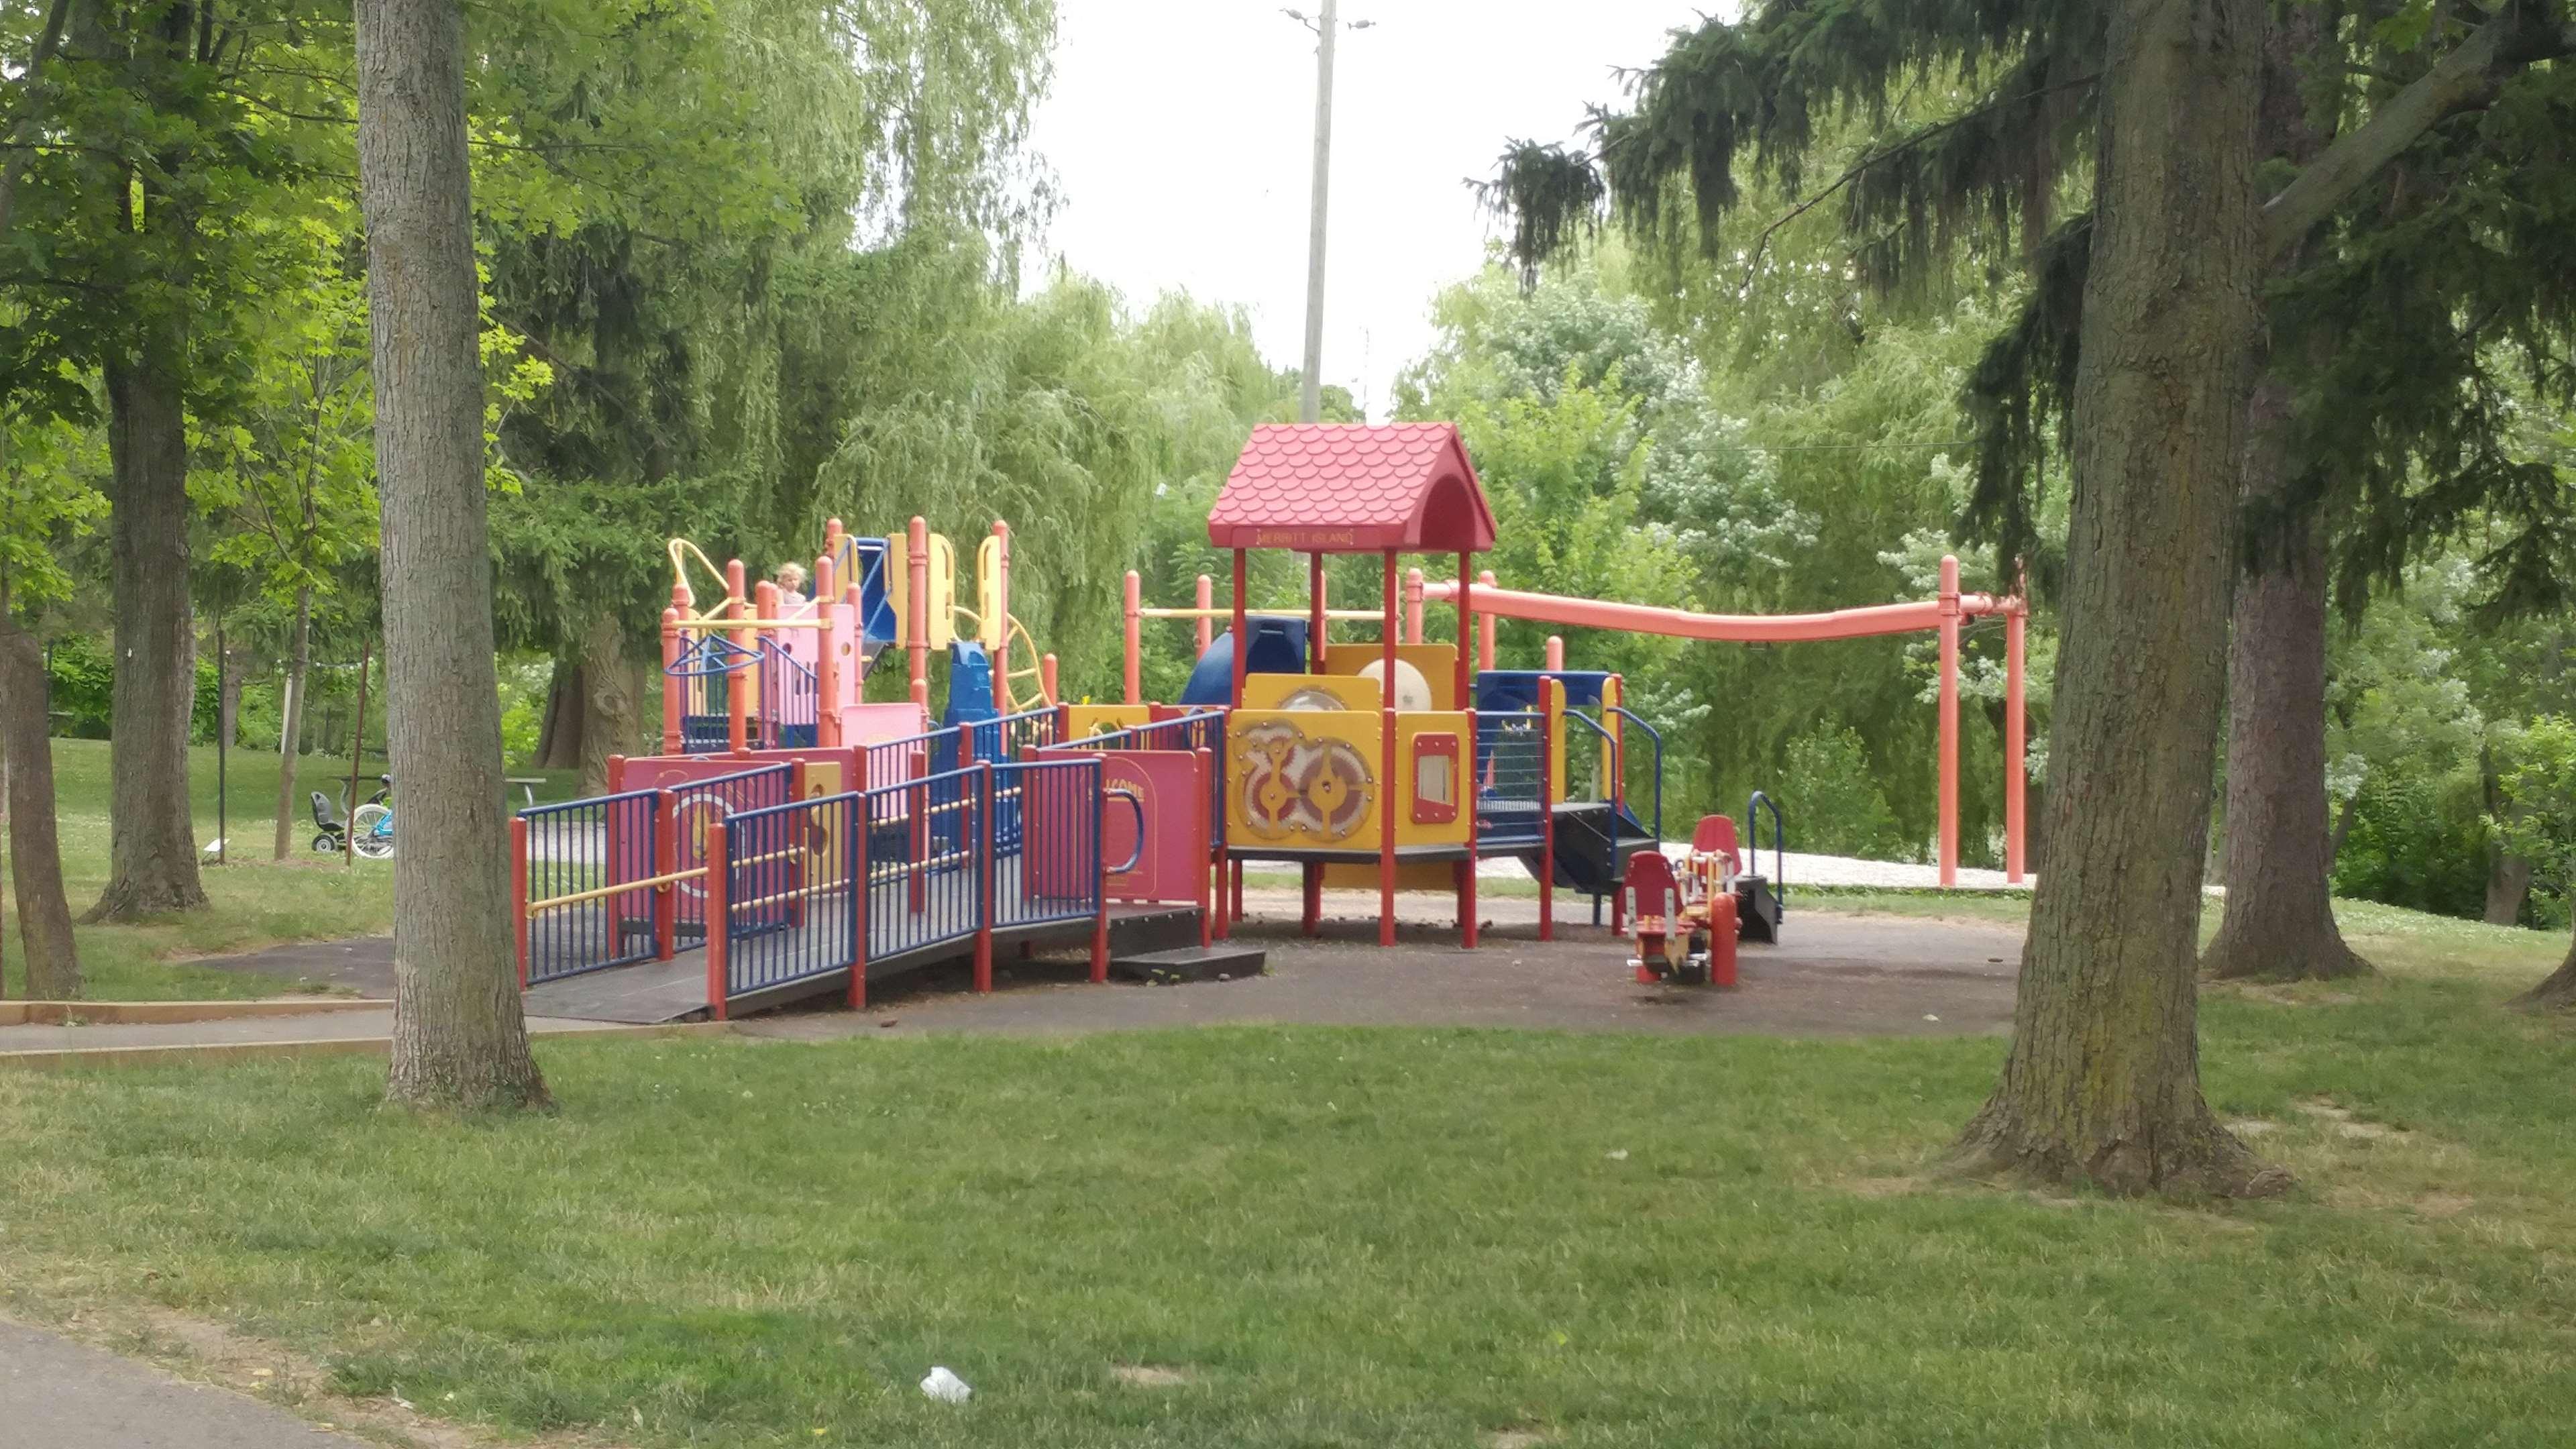 Best Western Plus Rose City Suites in Welland: MerrittI sland Park